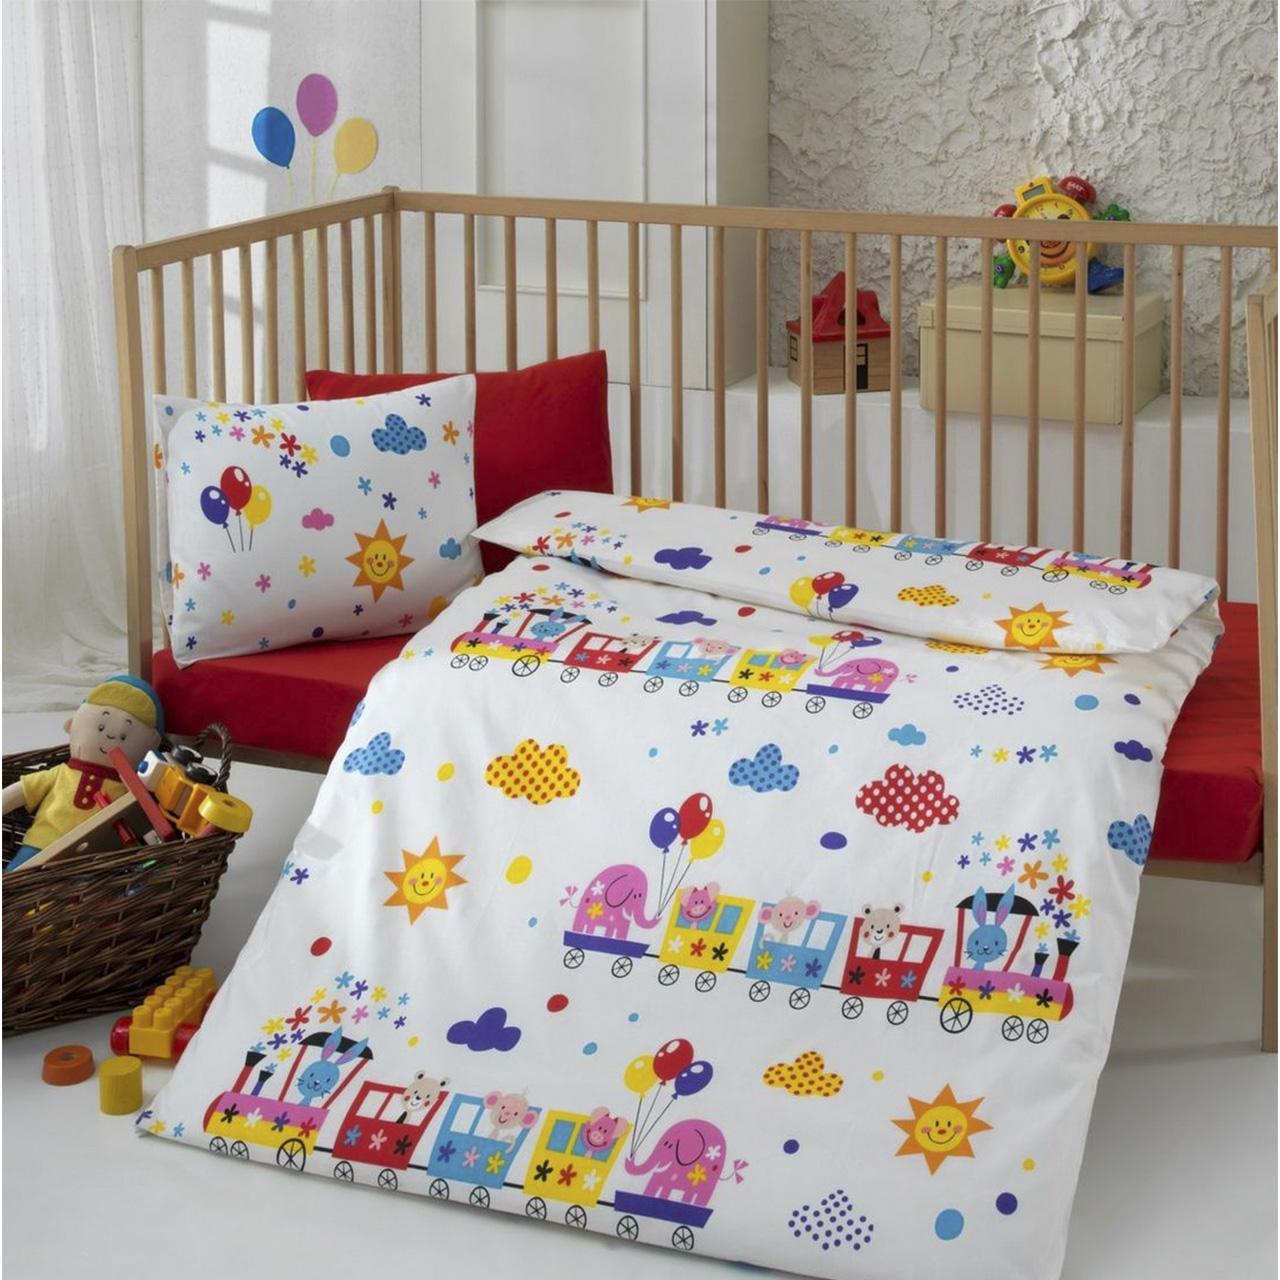 سرویس ملحفه 4 تکه کودک کاتن باکس  مدل  Yellow choo-choo | Cotton Box Yellow choo-choo child Bedsheet Set 1 Person 4 Pcs